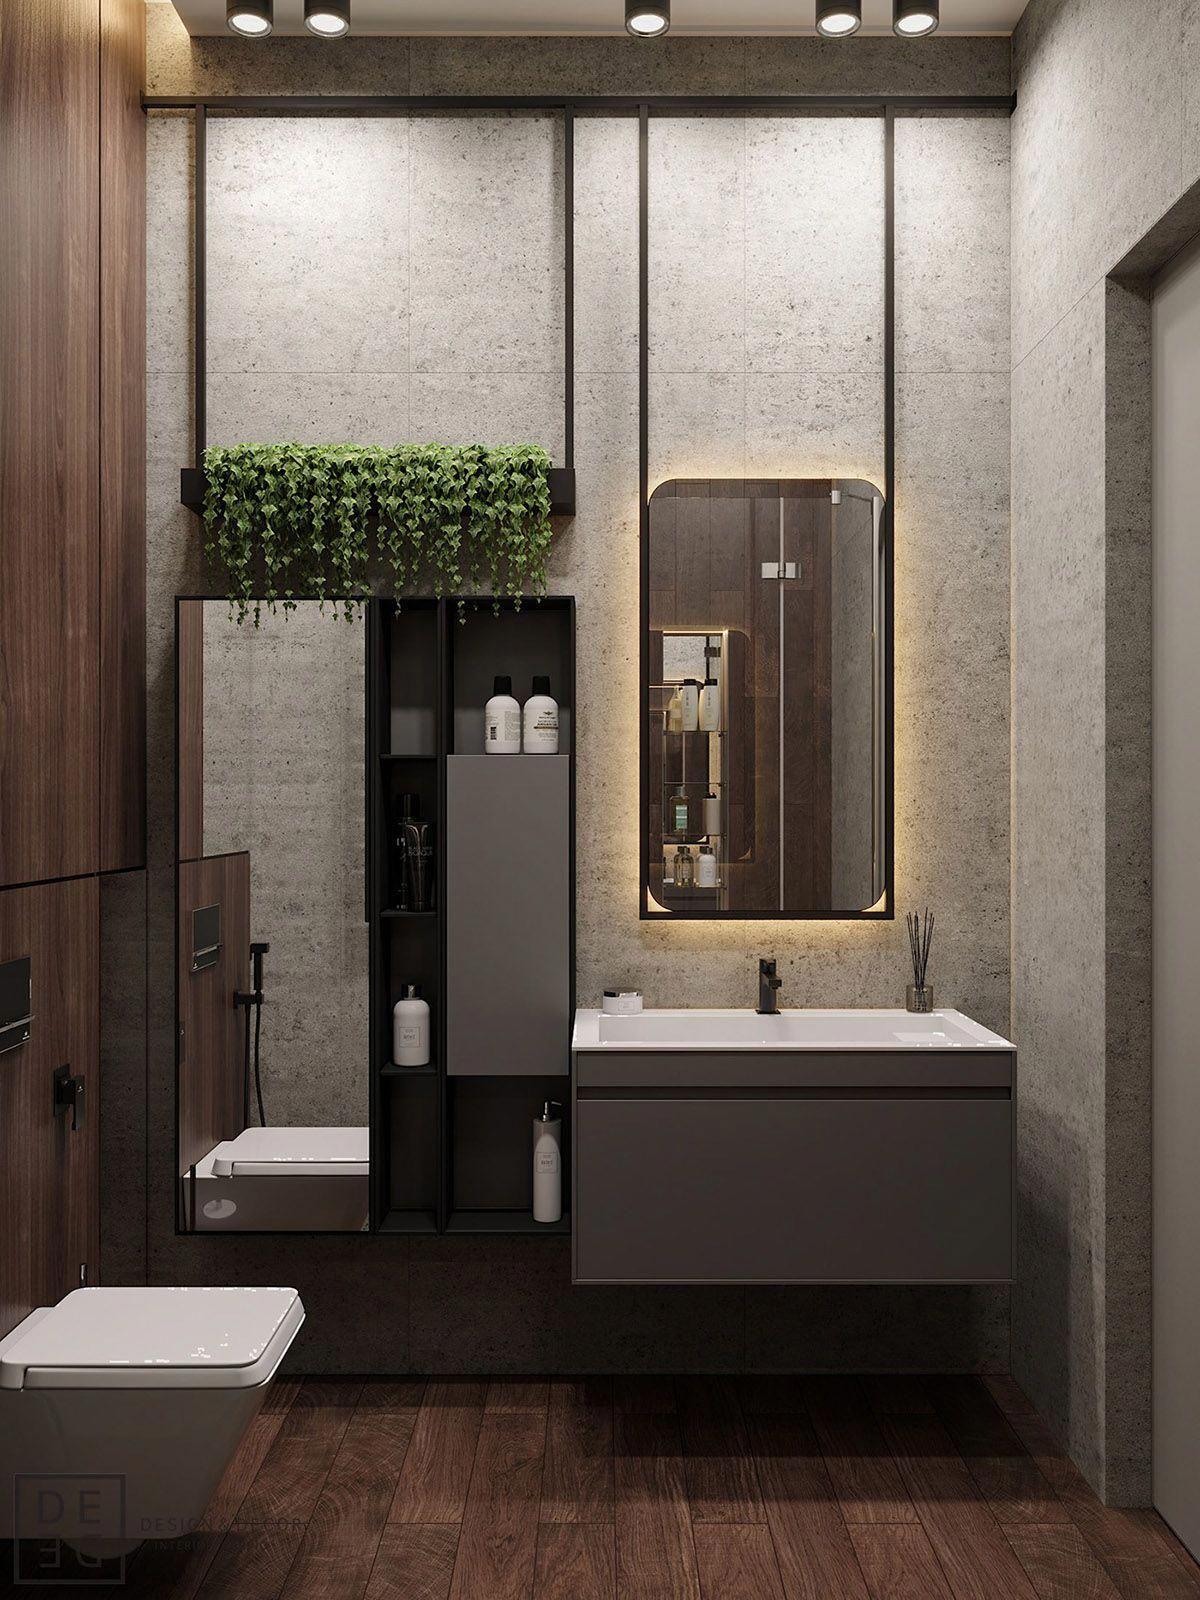 Cocoon Contemporary Bathroom Design Inspiration High End Stainless Steel Design Ta Bathroom Mirror Design Contemporary Bathroom Designs Bathroom Design Decor